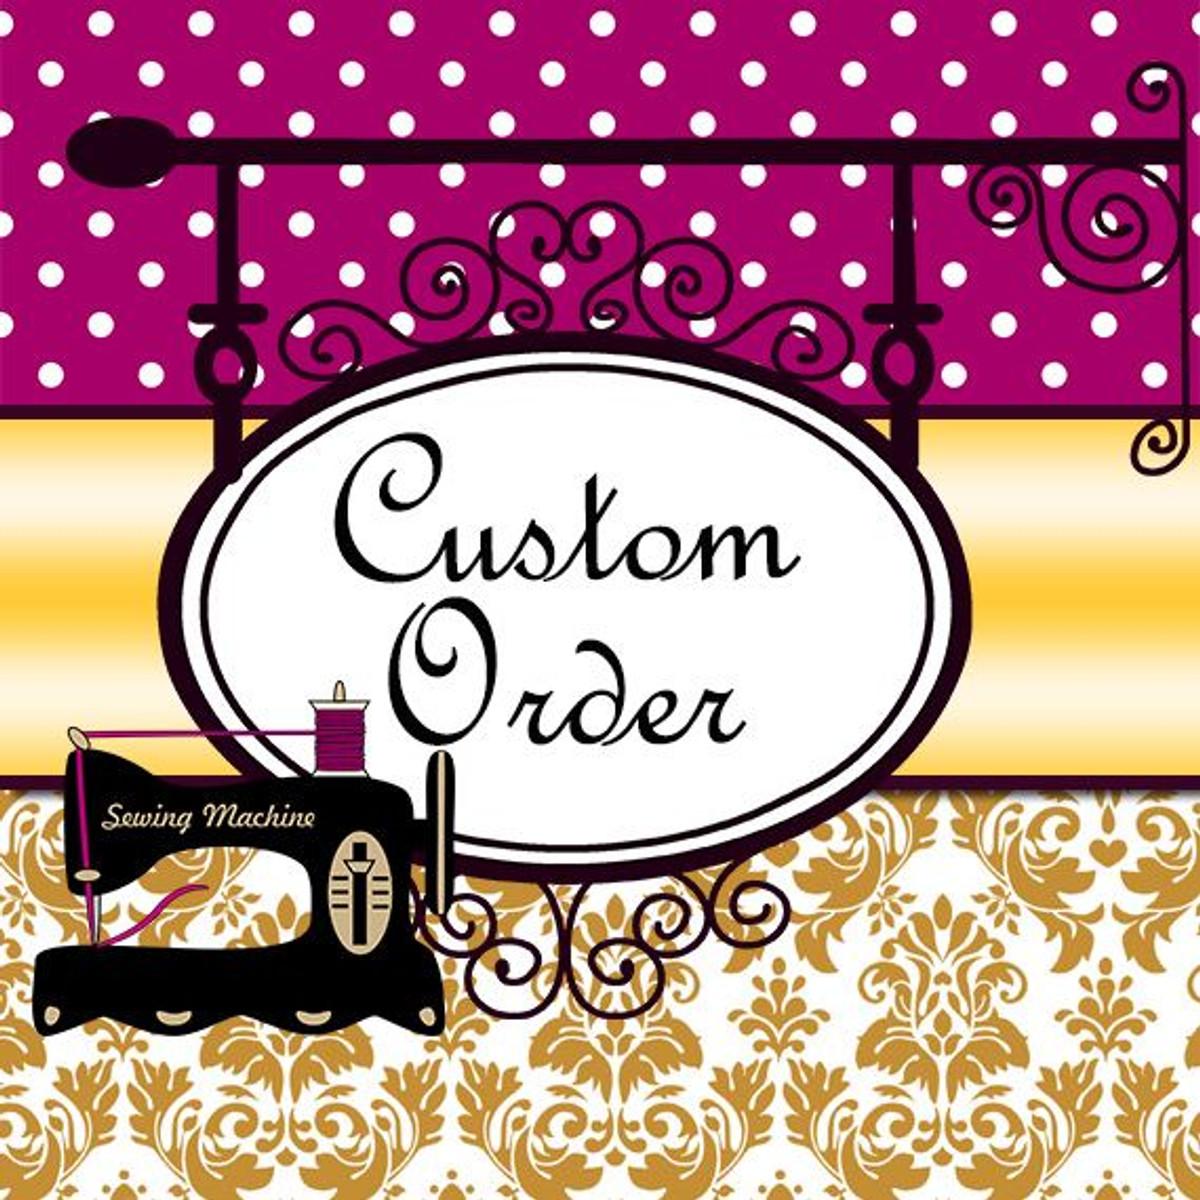 Custom Wedding Dress for ChristinaB